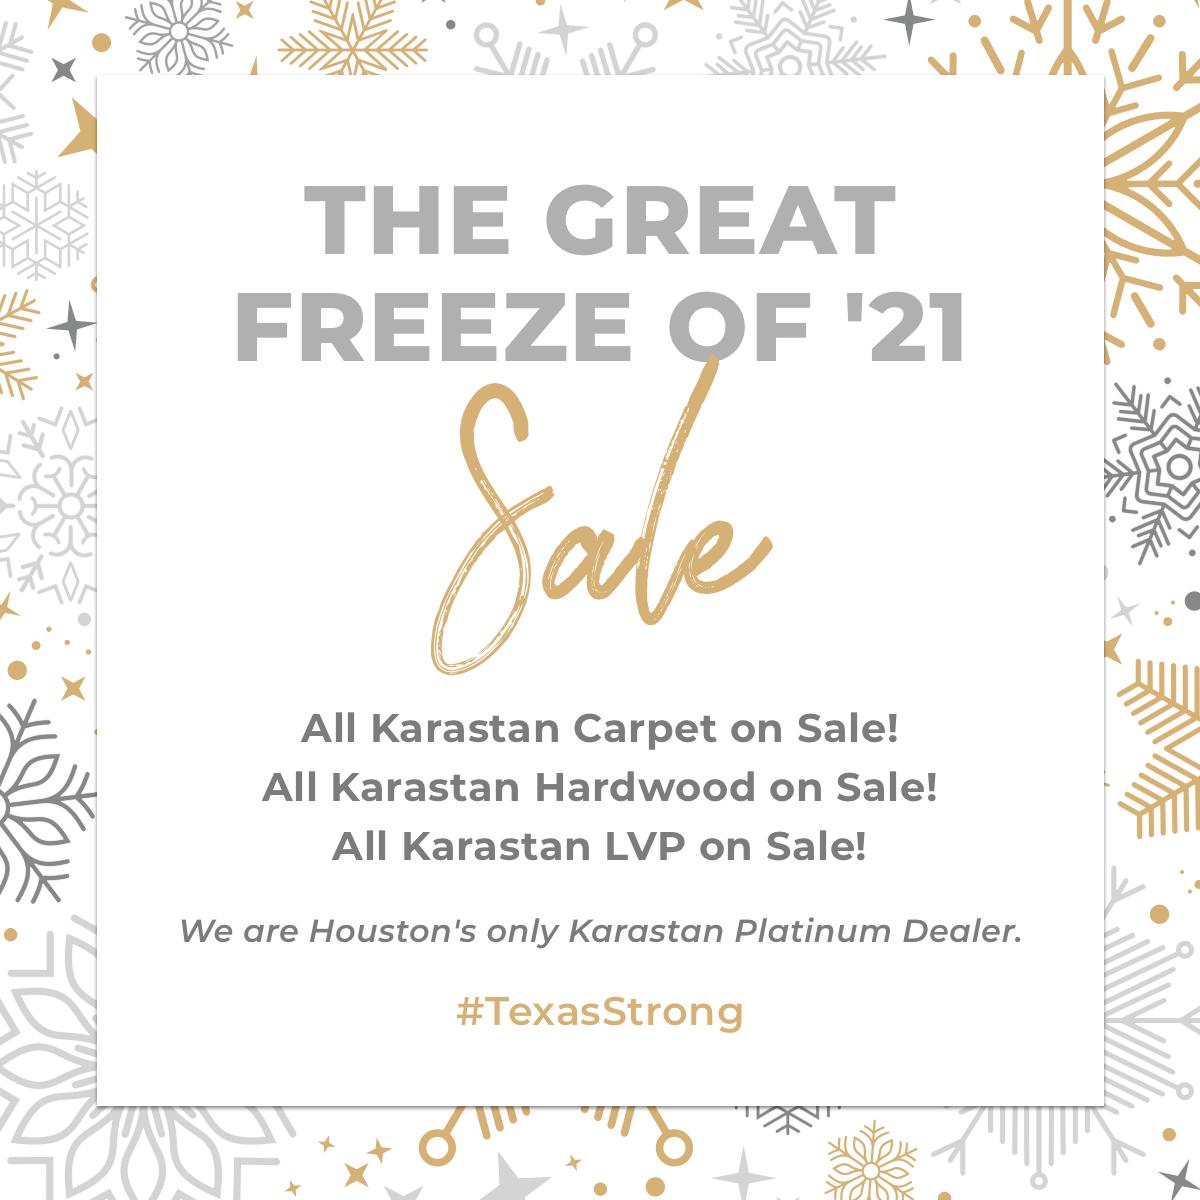 The Great Freeze of '21 Sale - All Karastan carpet, Hardwood & LVP on sale!